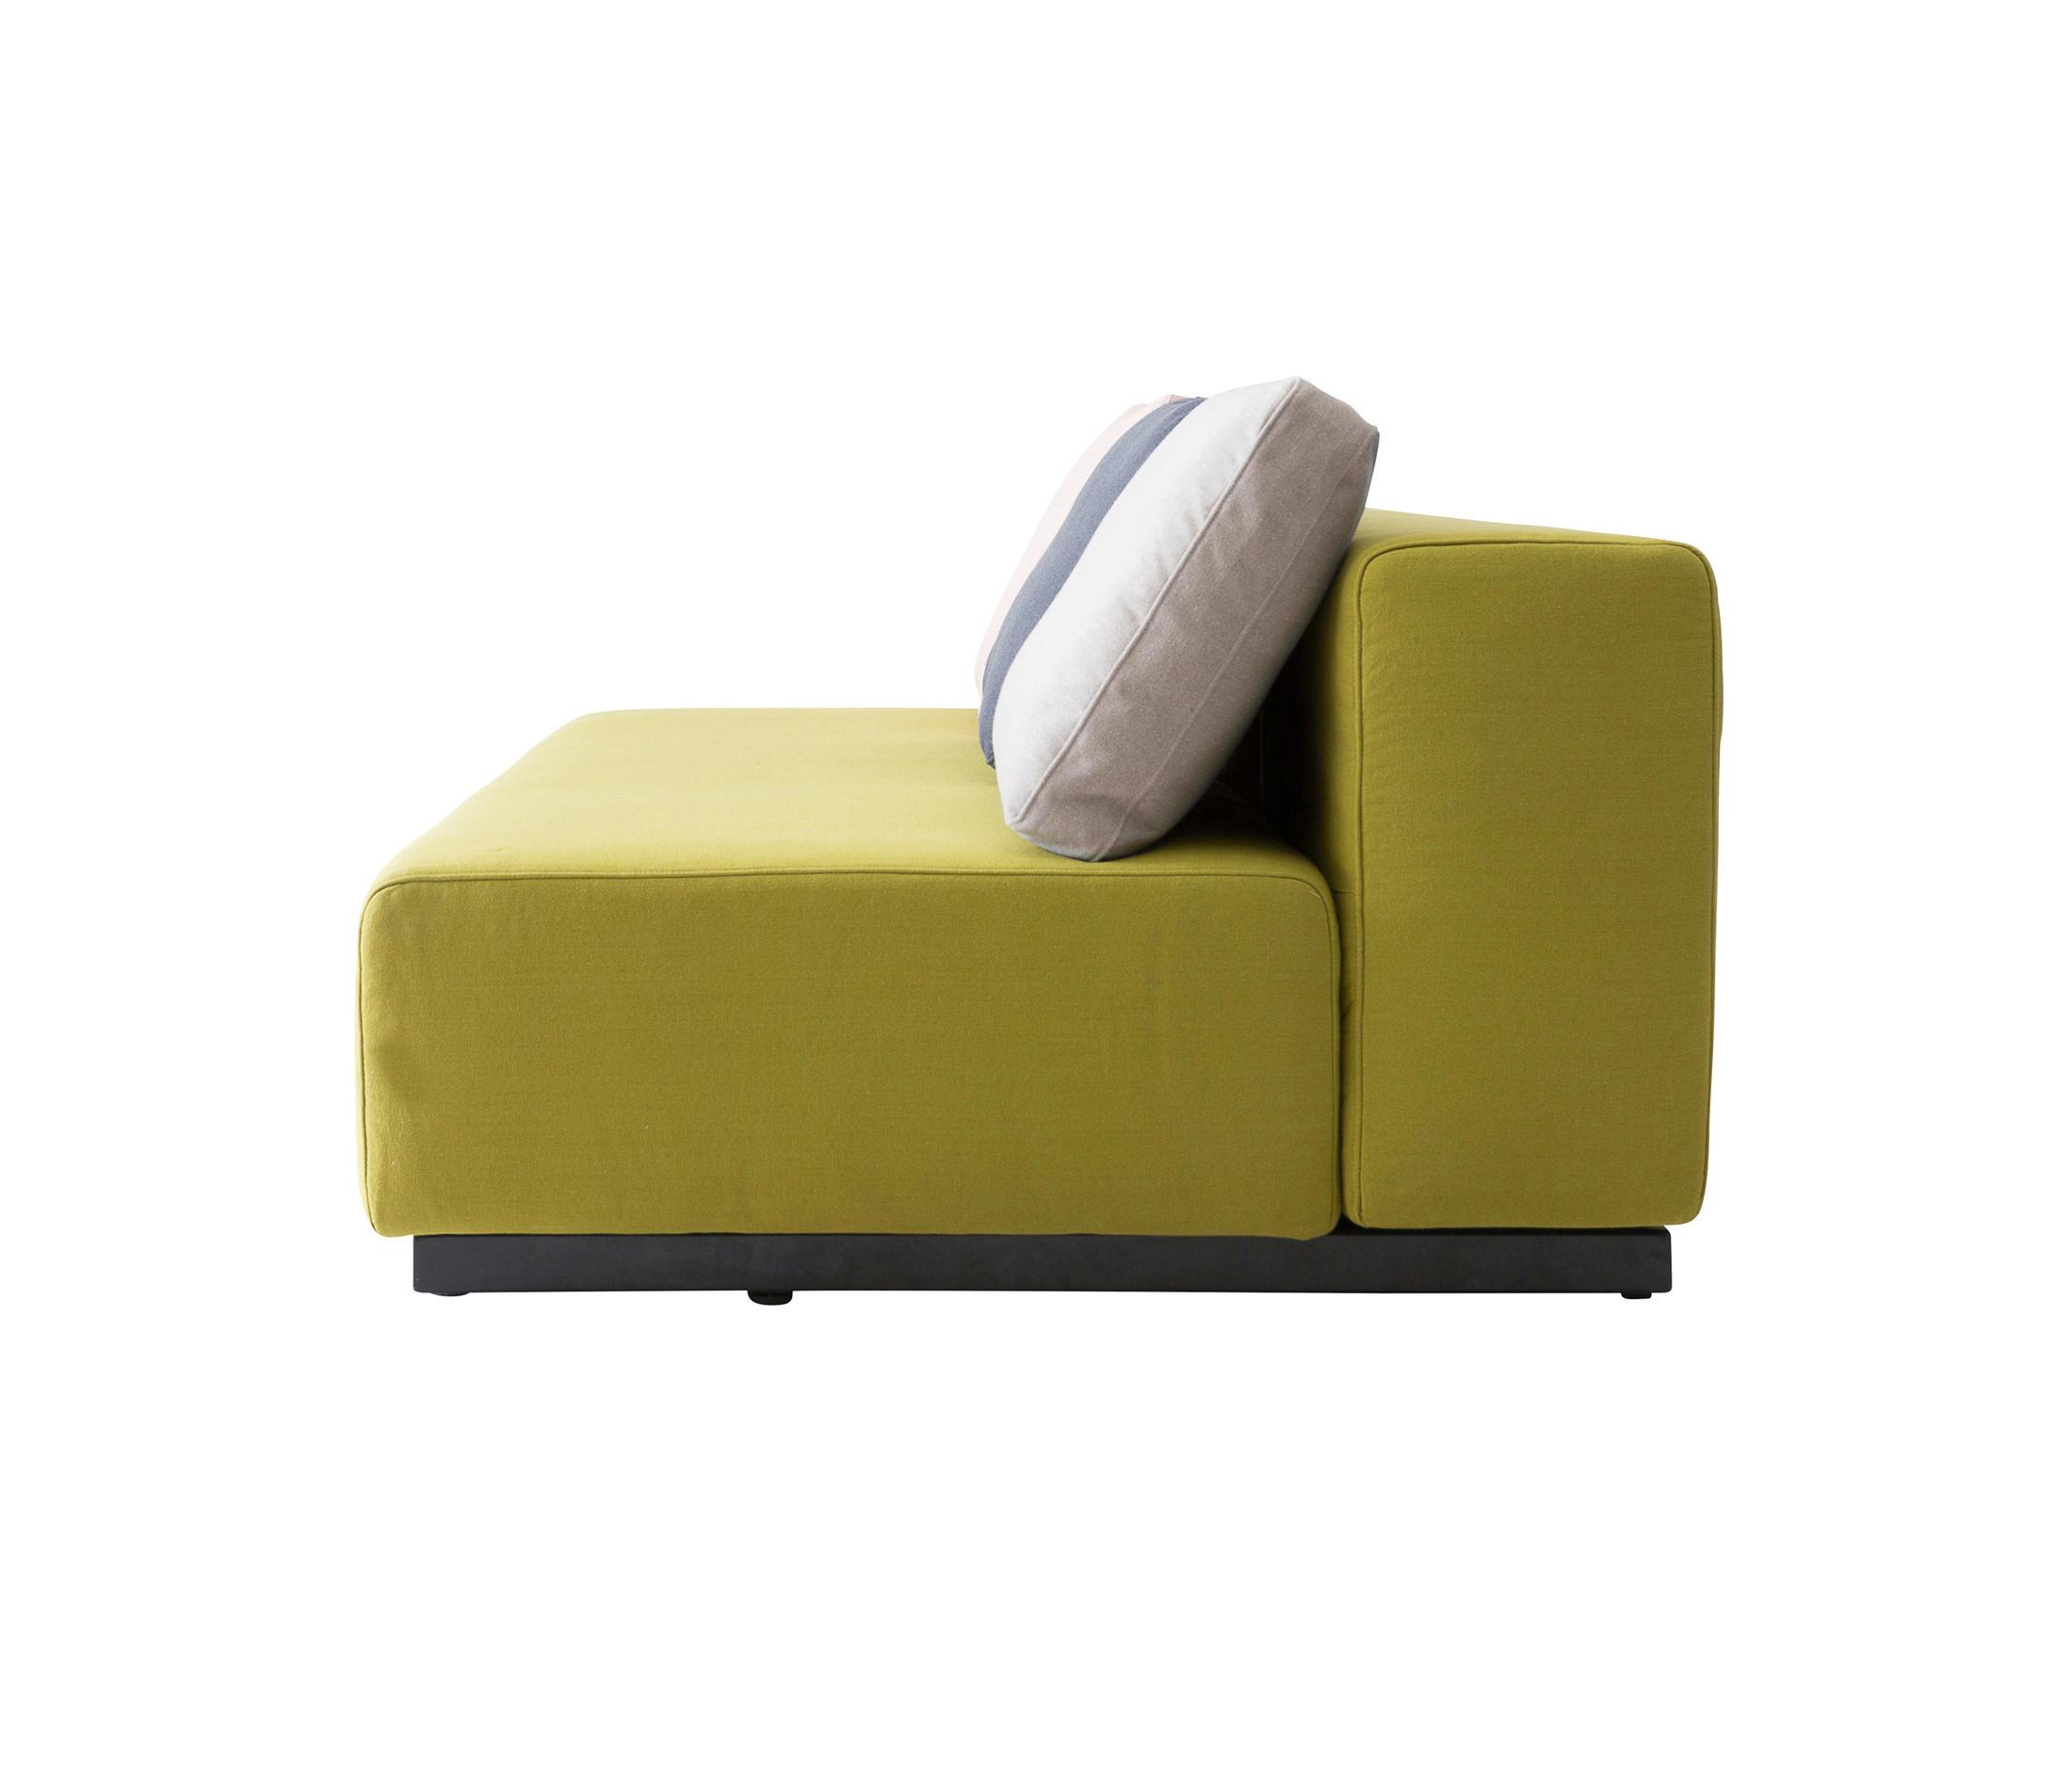 nevada canap canap s lits de softline a s architonic. Black Bedroom Furniture Sets. Home Design Ideas